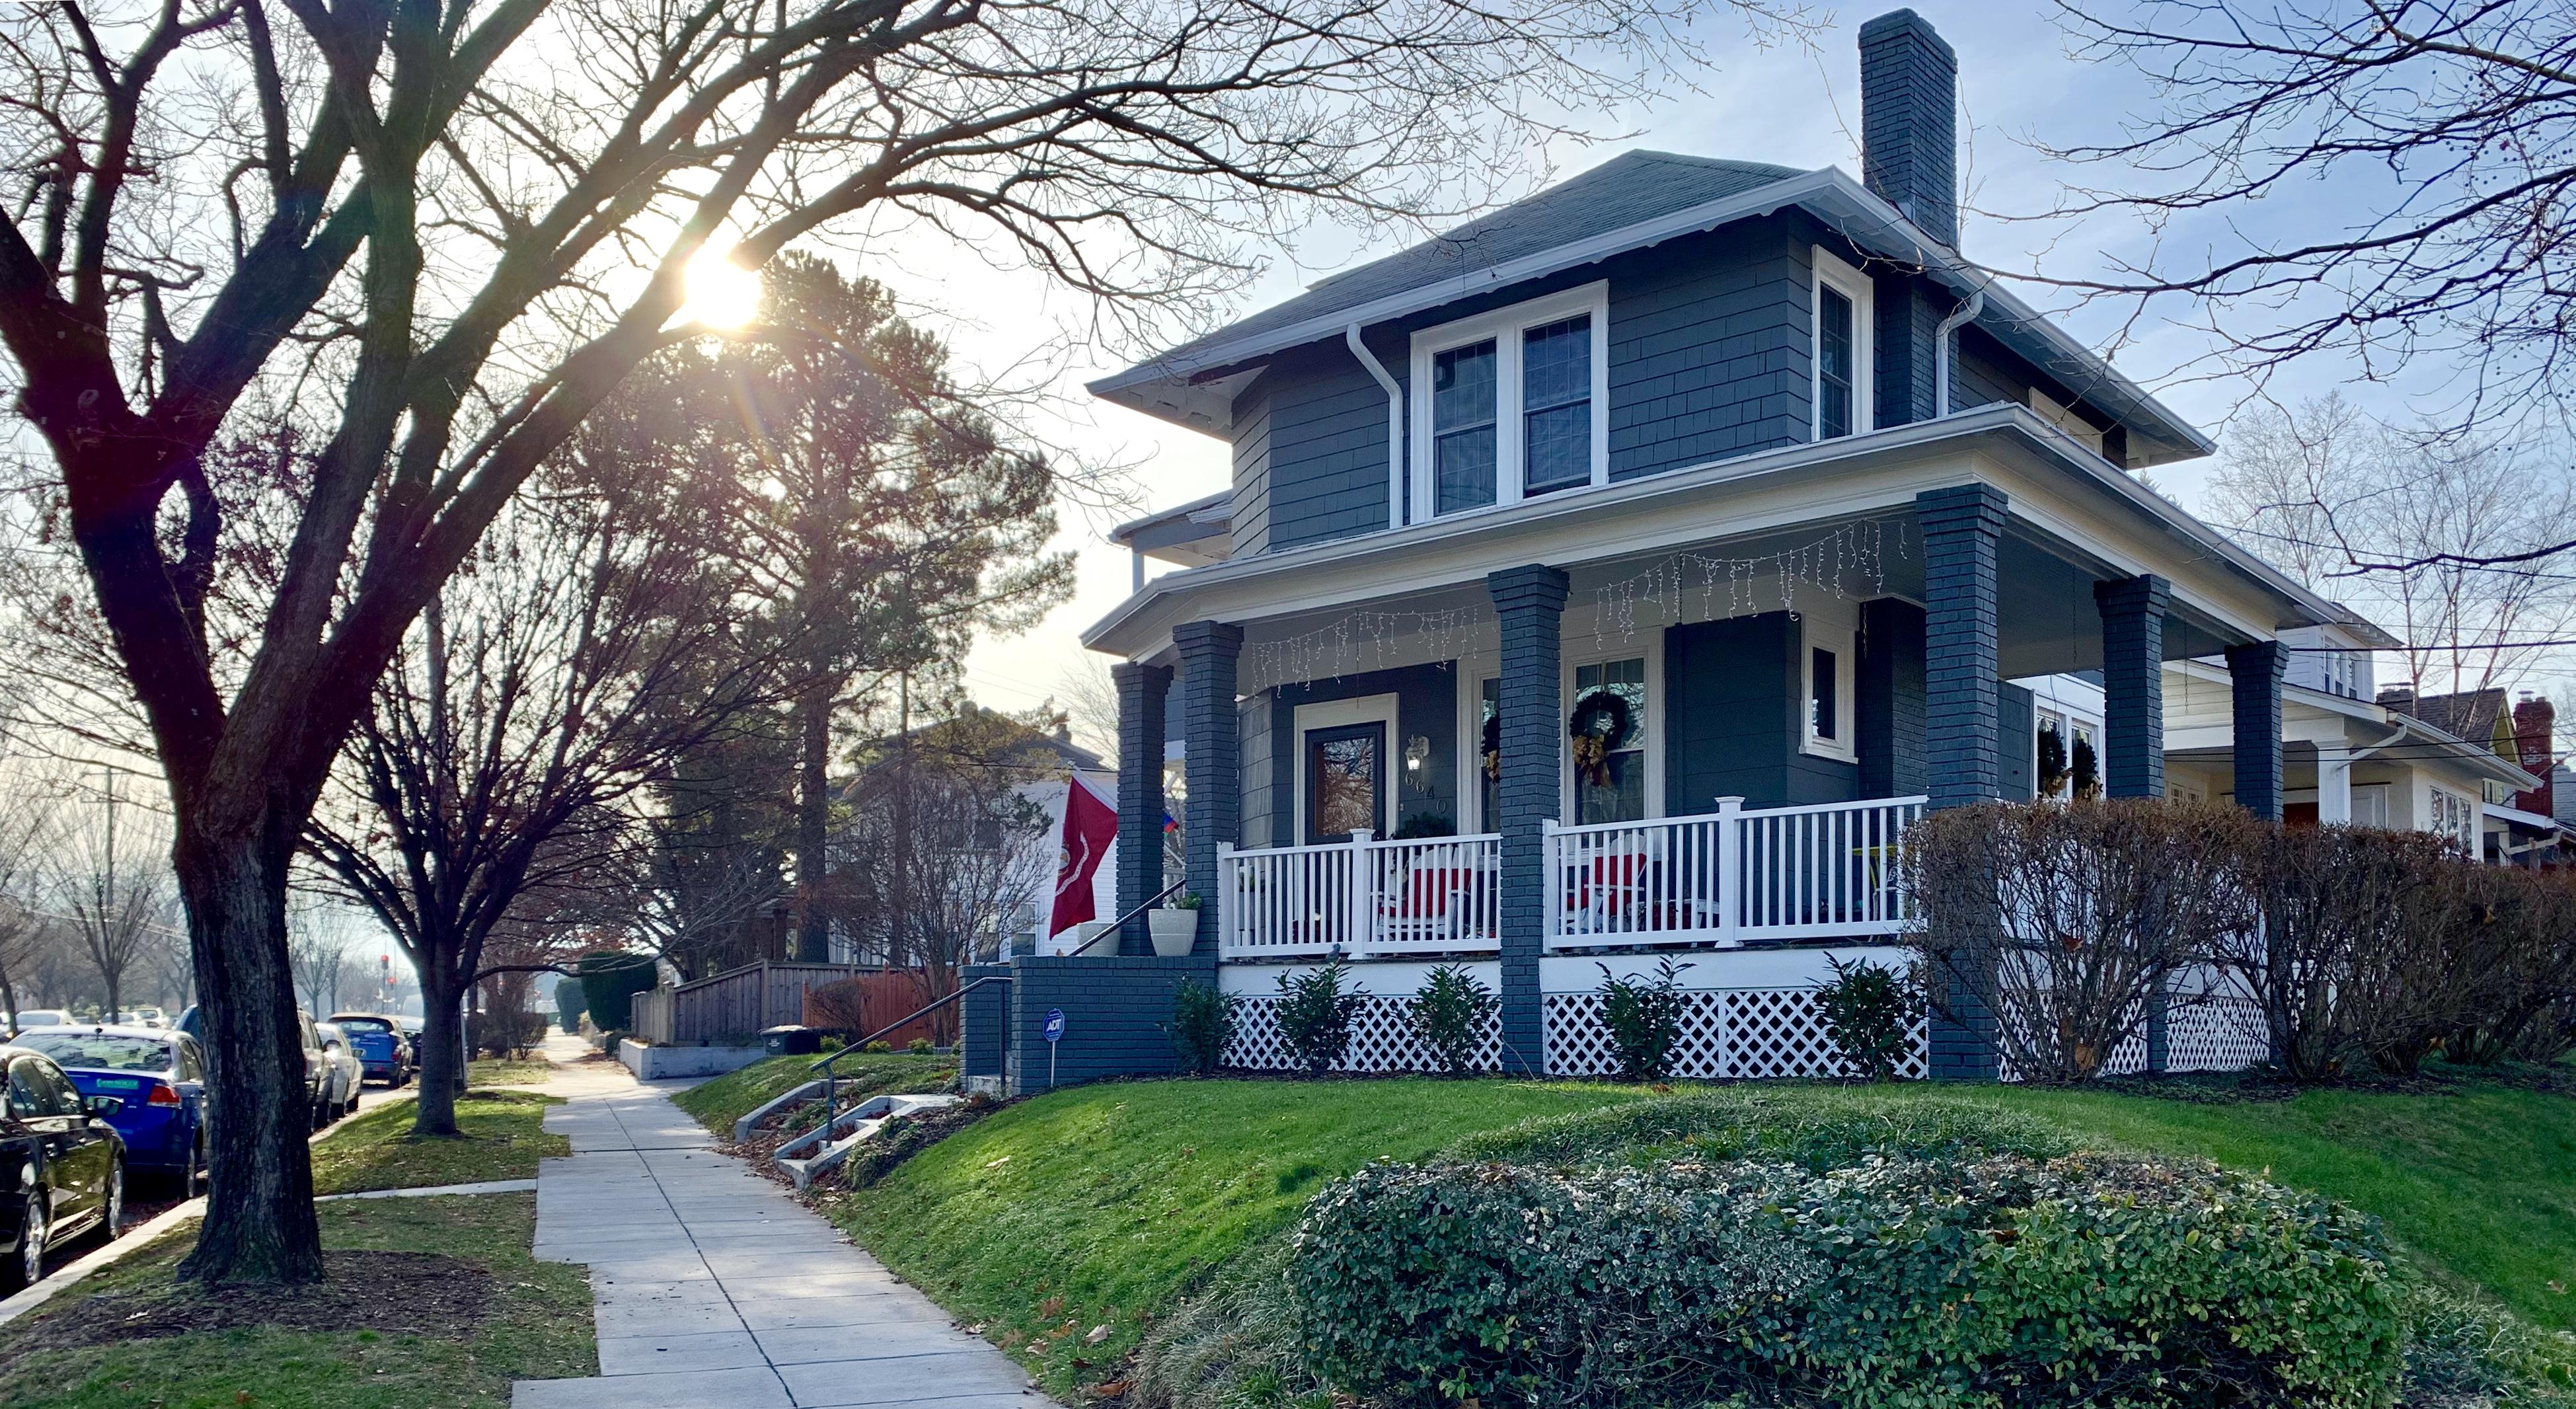 Craftsman Homes in Washington, DC. Whittier Pl in Takoma